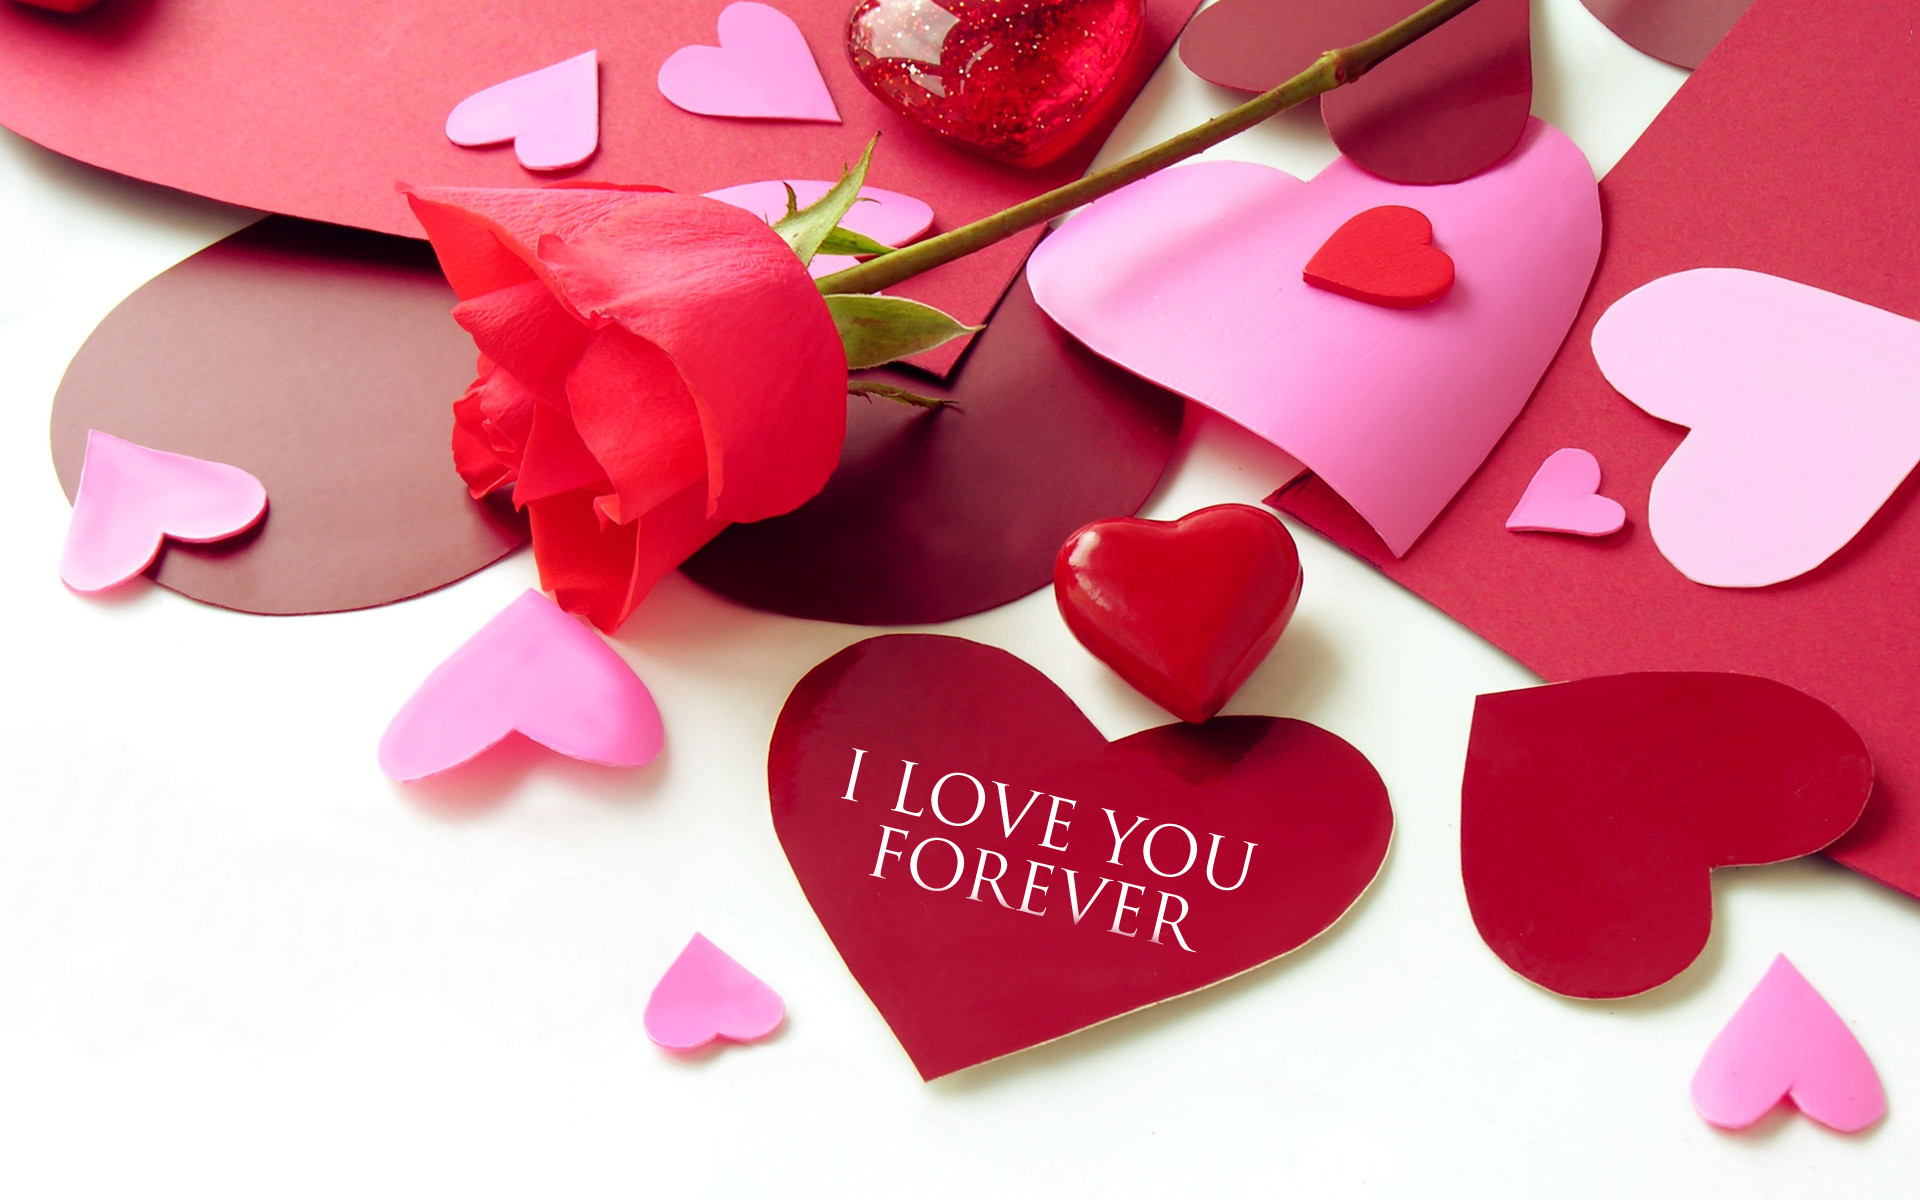 Hd Wallpaper   Src Amazing I Love U Images Wallpapers - Most Beautiful I Love You - HD Wallpaper